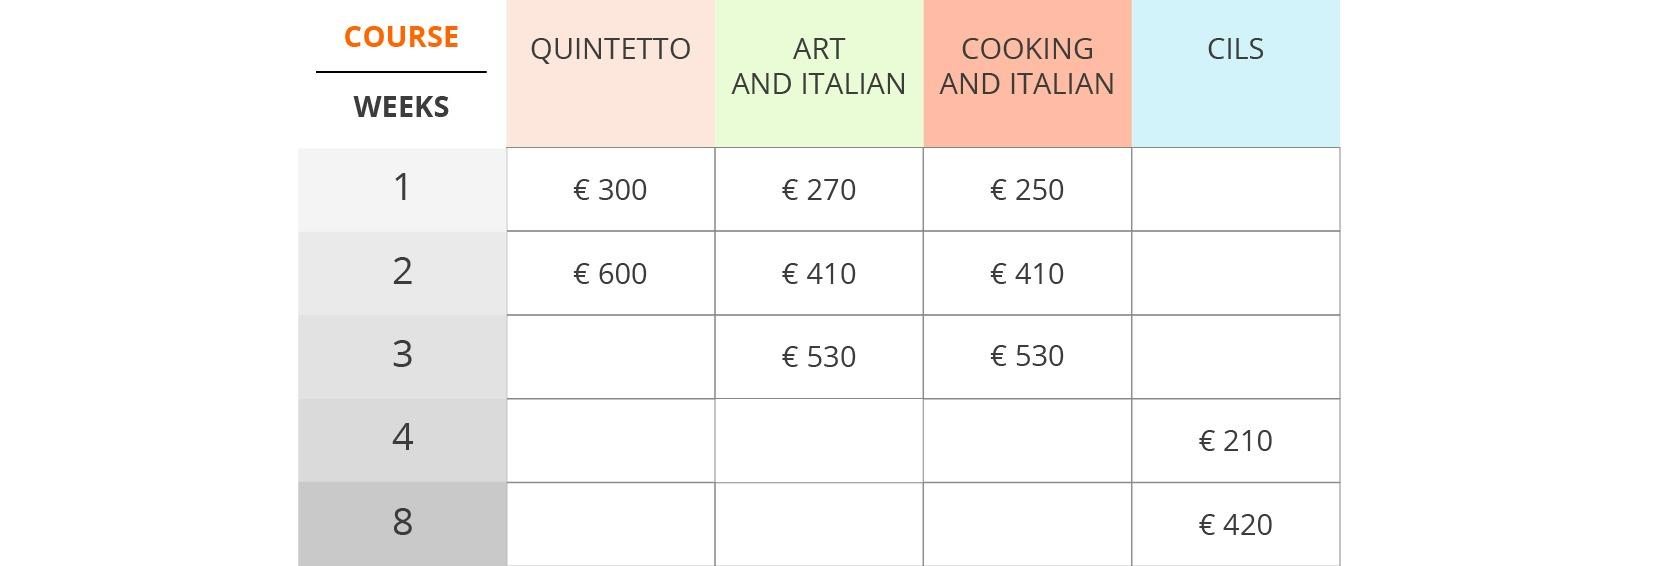 tabella prezzi parola3 03 1 - 课程介绍